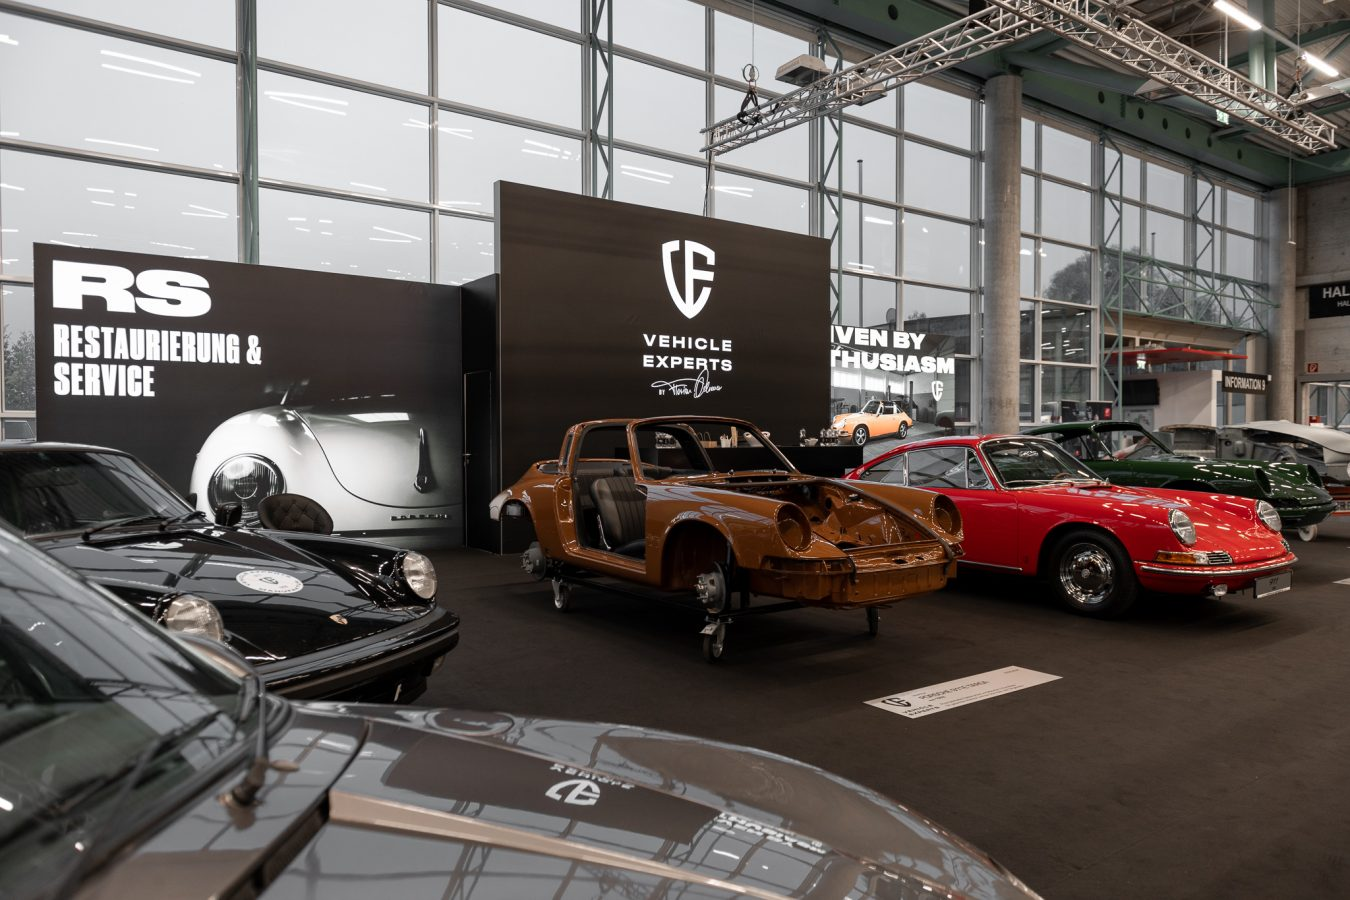 Vehicle Experts Ausstellung